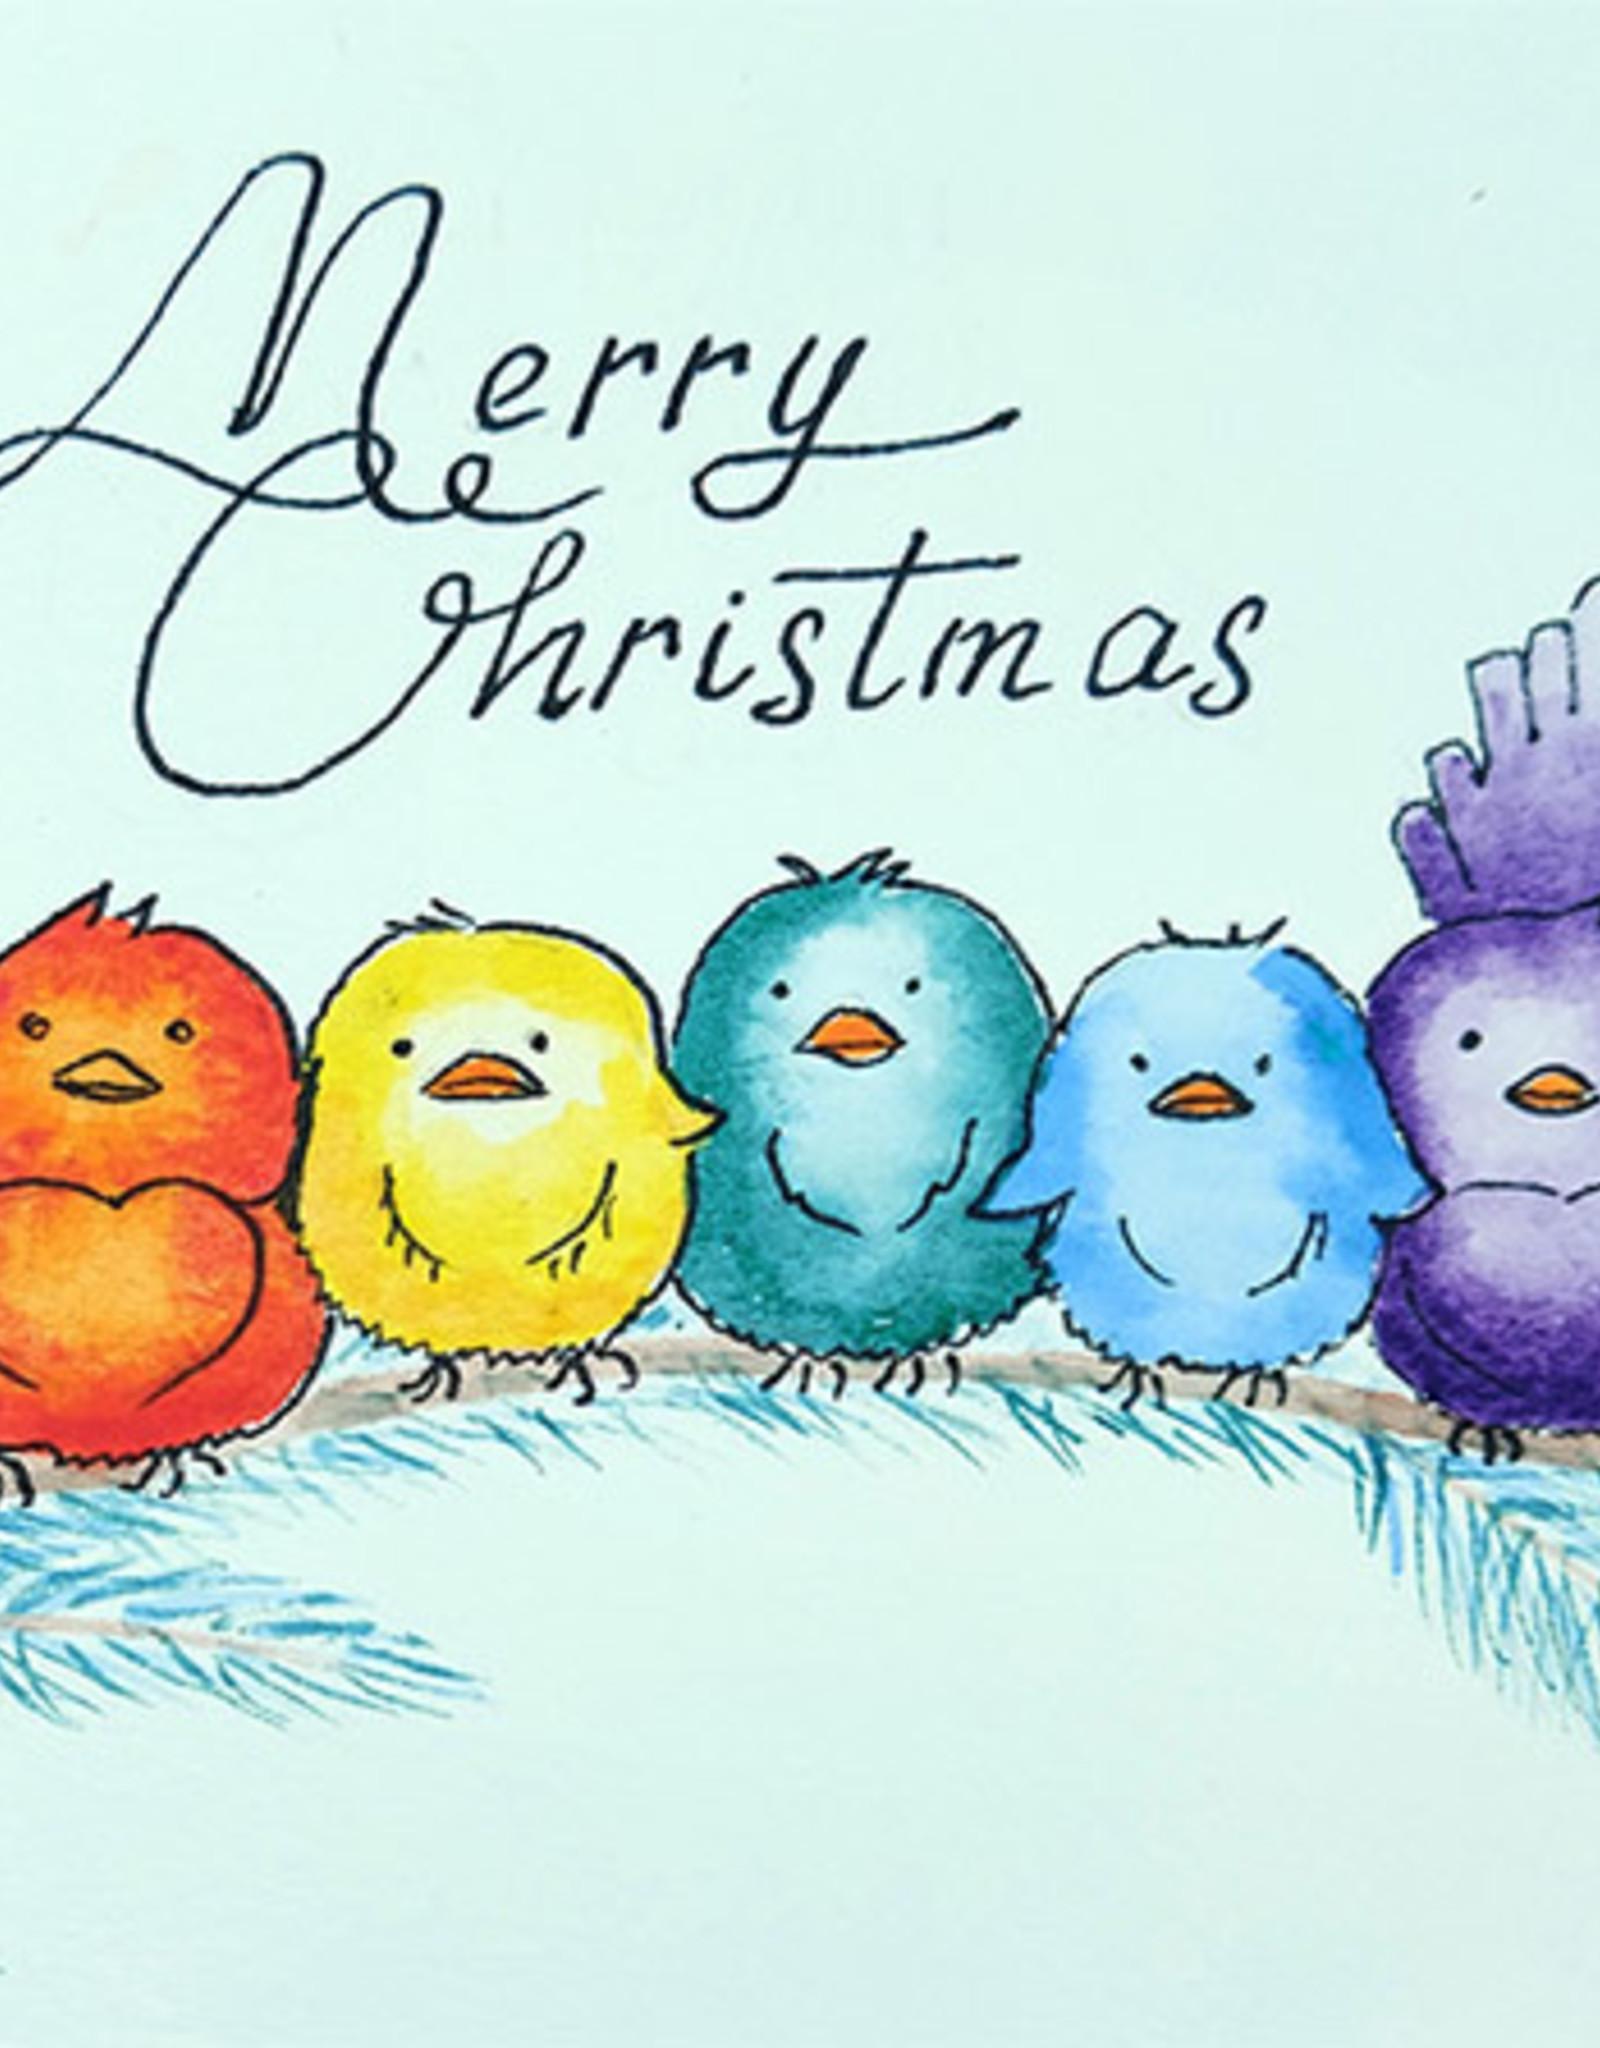 Tamara S Watercolour/Drawing Art Class Merry Christmas Greeting Card Wed Nov 24 11:00  to 12:00 pm